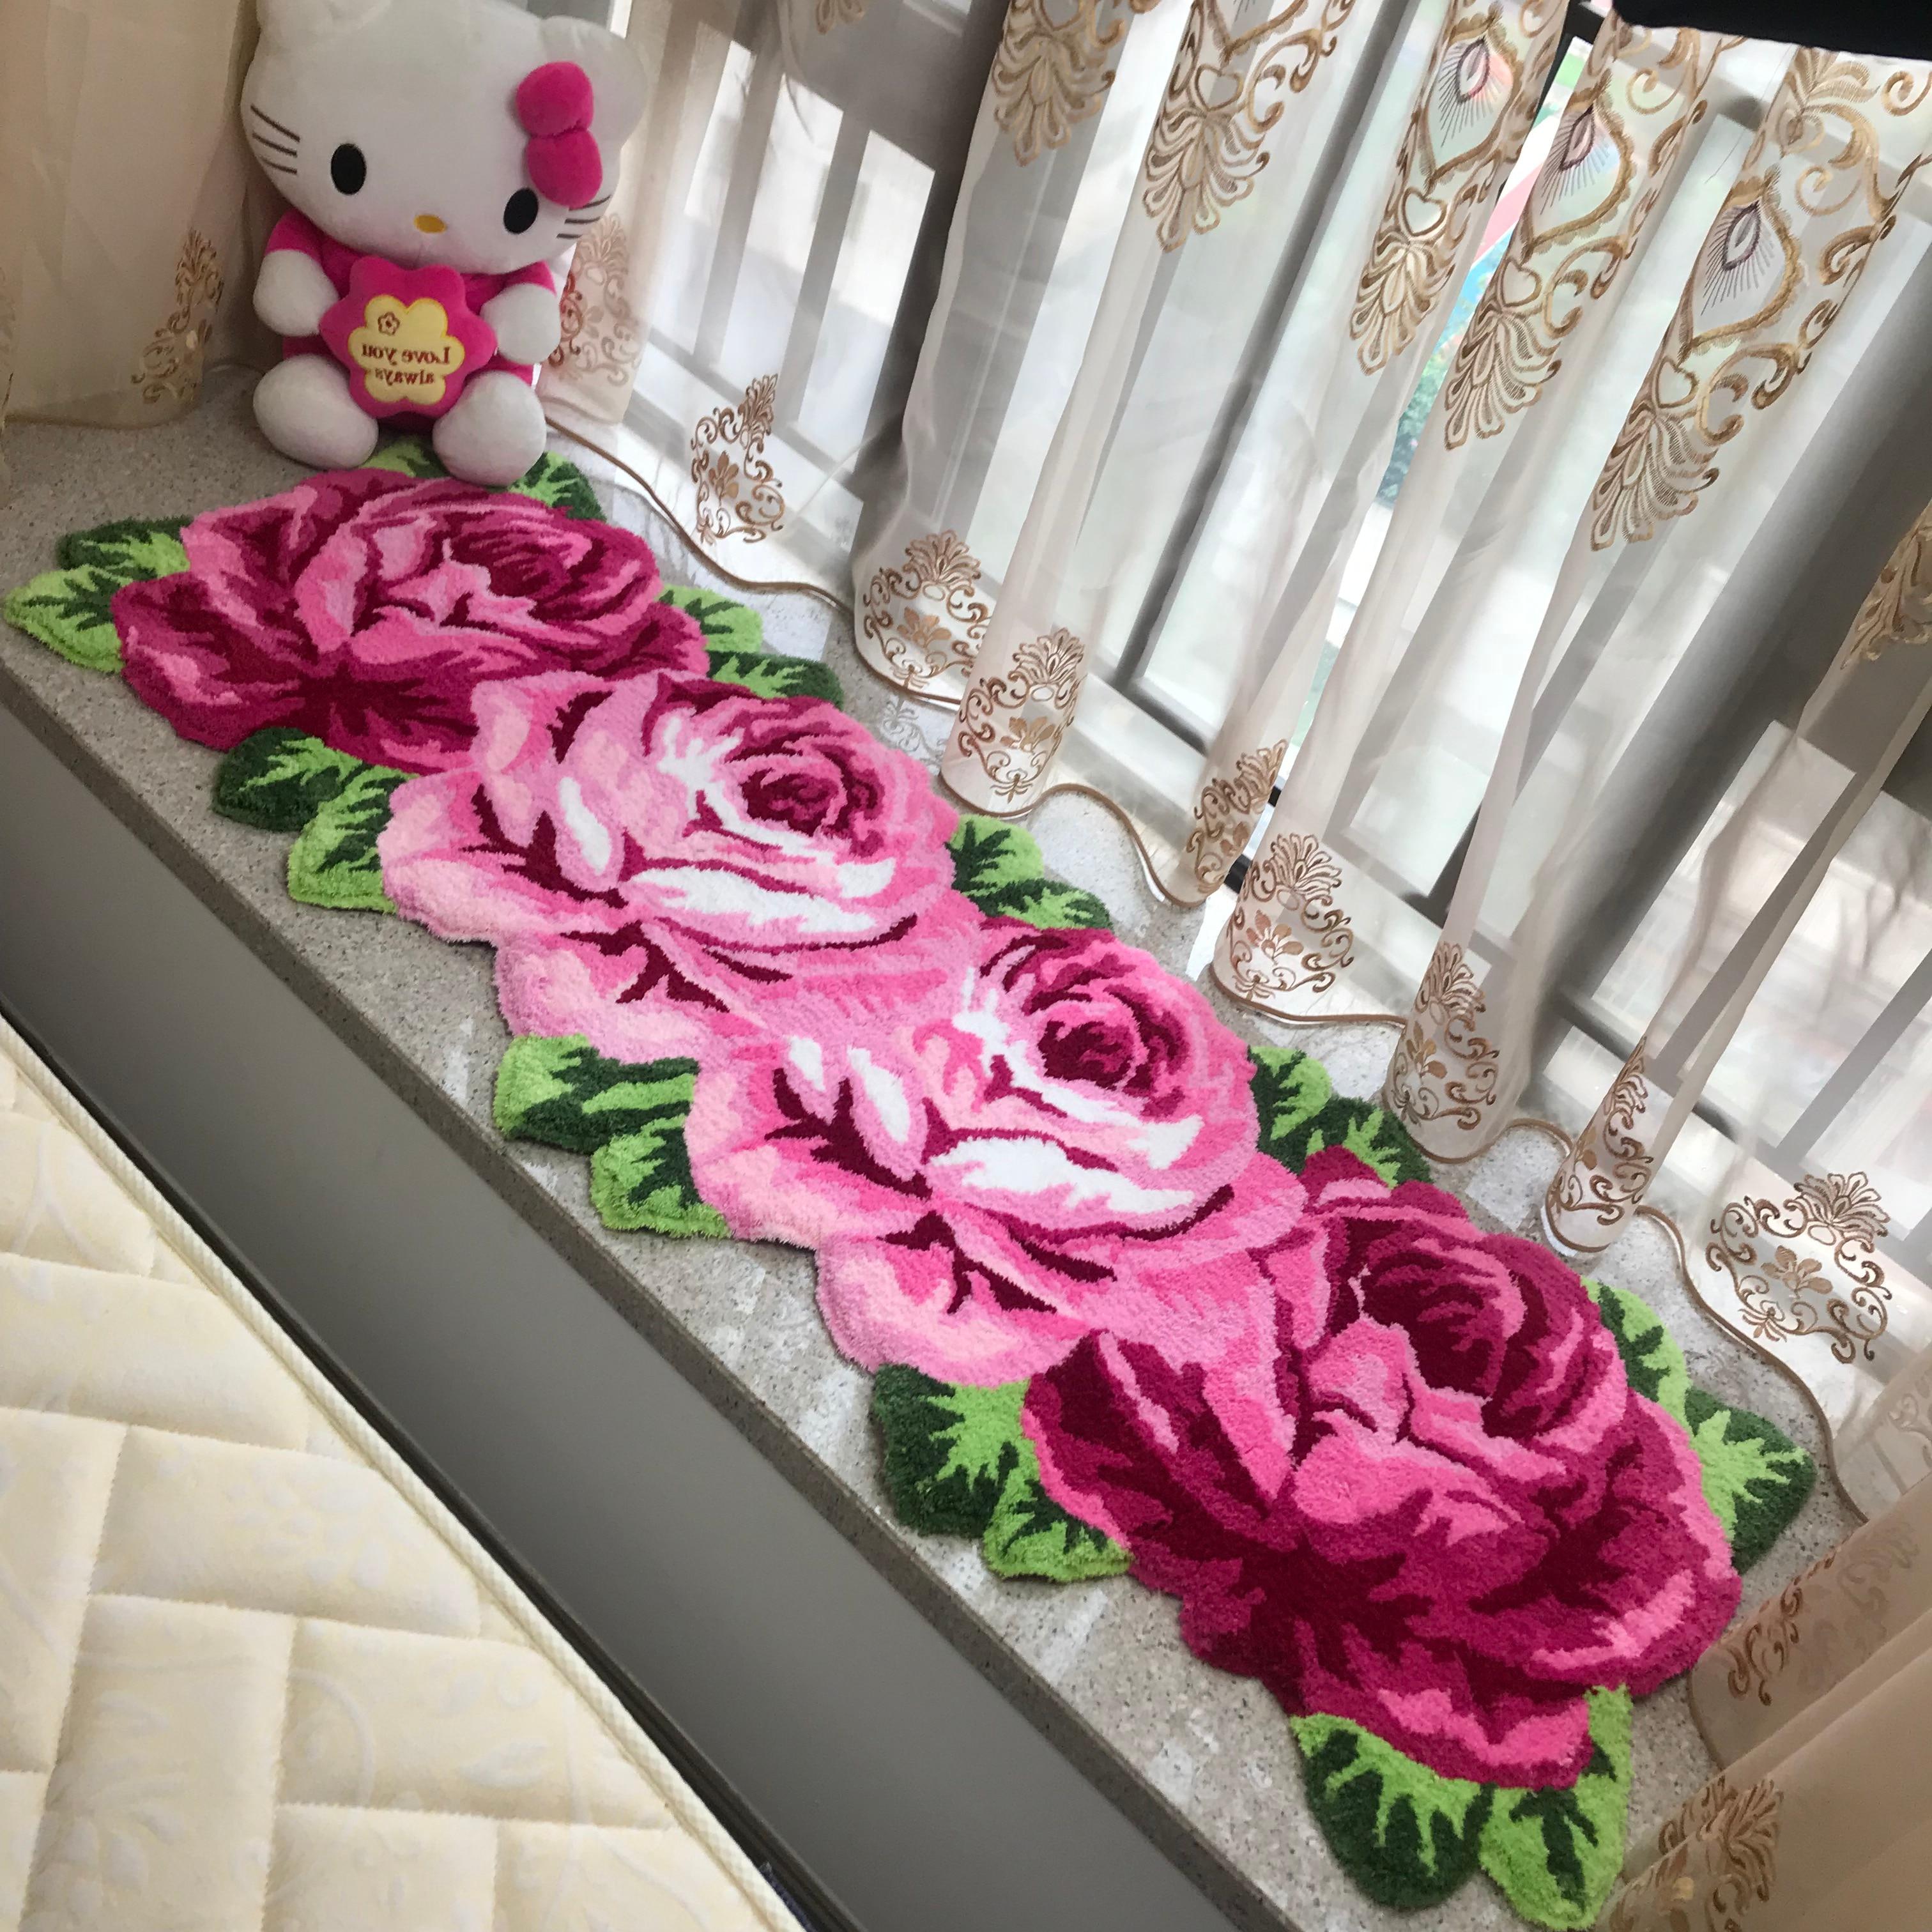 Nouveauté flocage rose tapis rose tapis rose tapis rose rouge